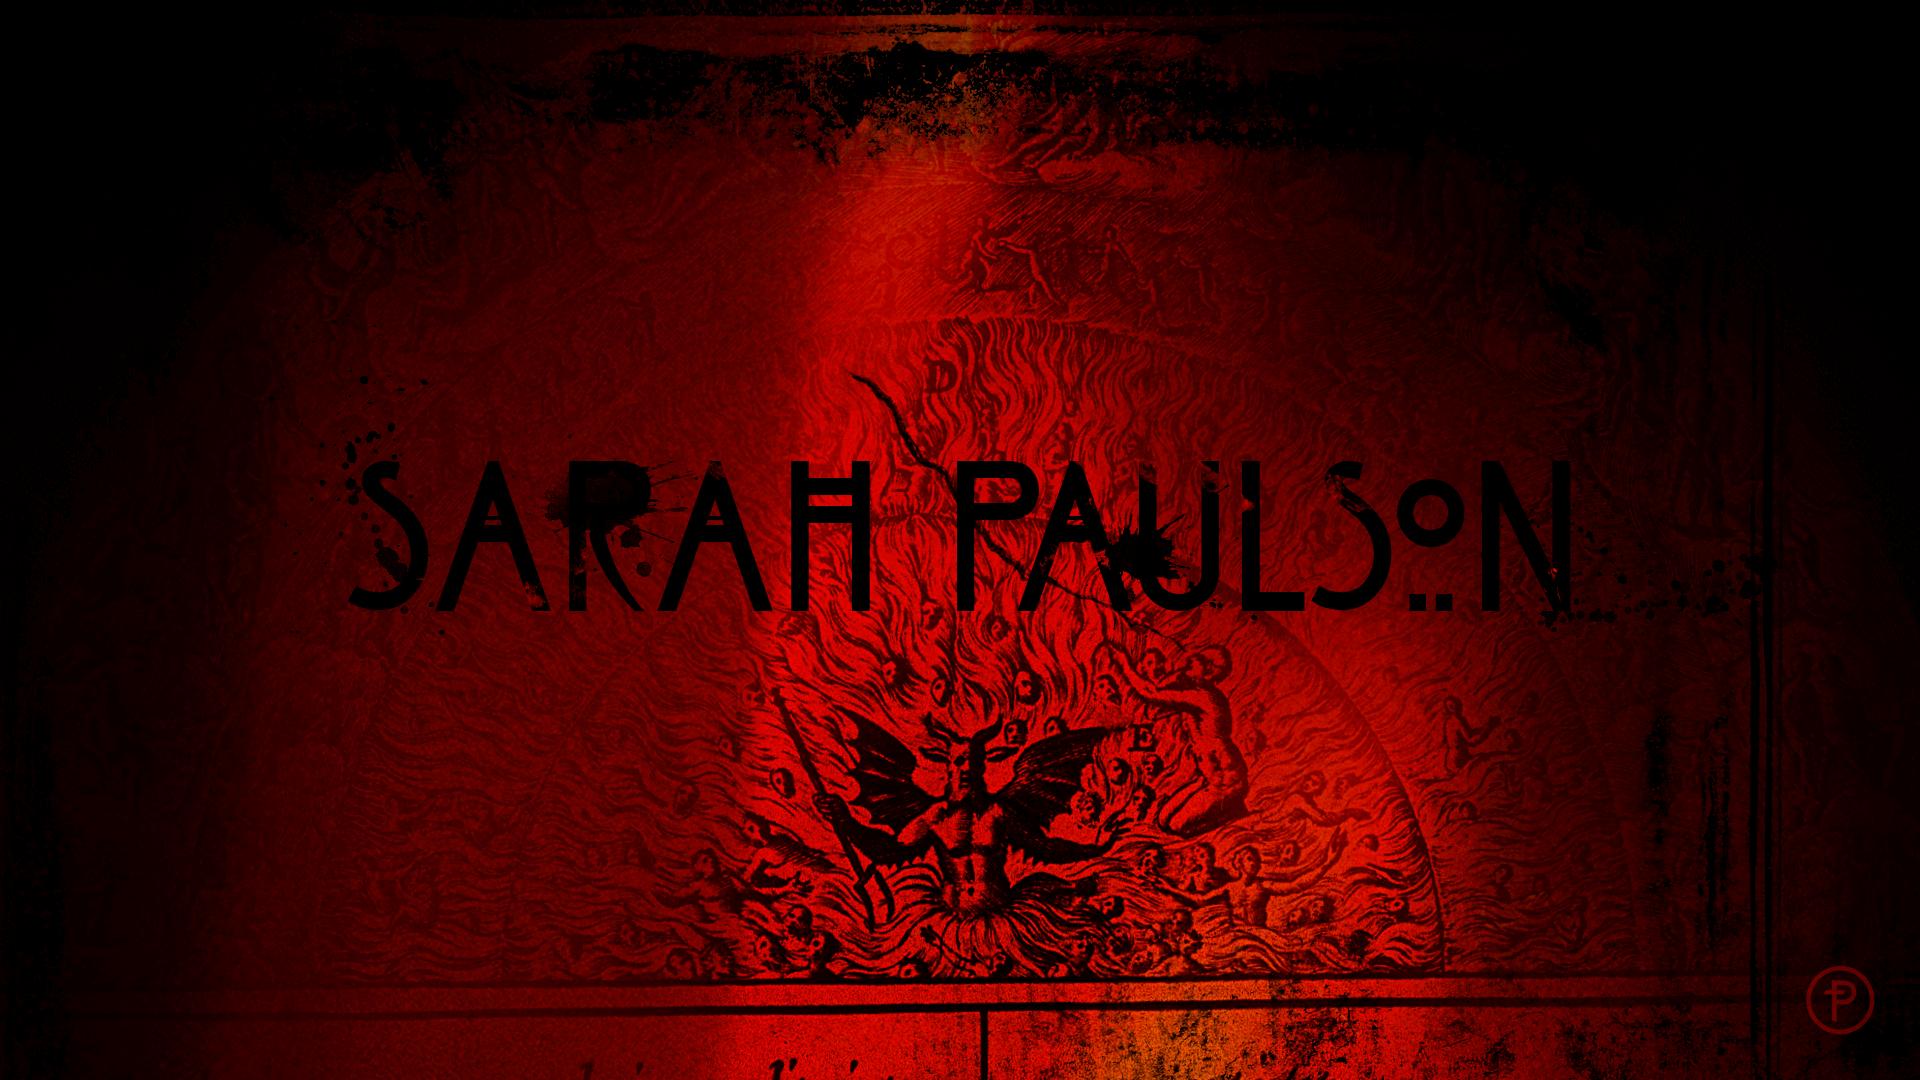 AHS_Apocalypse_004.png